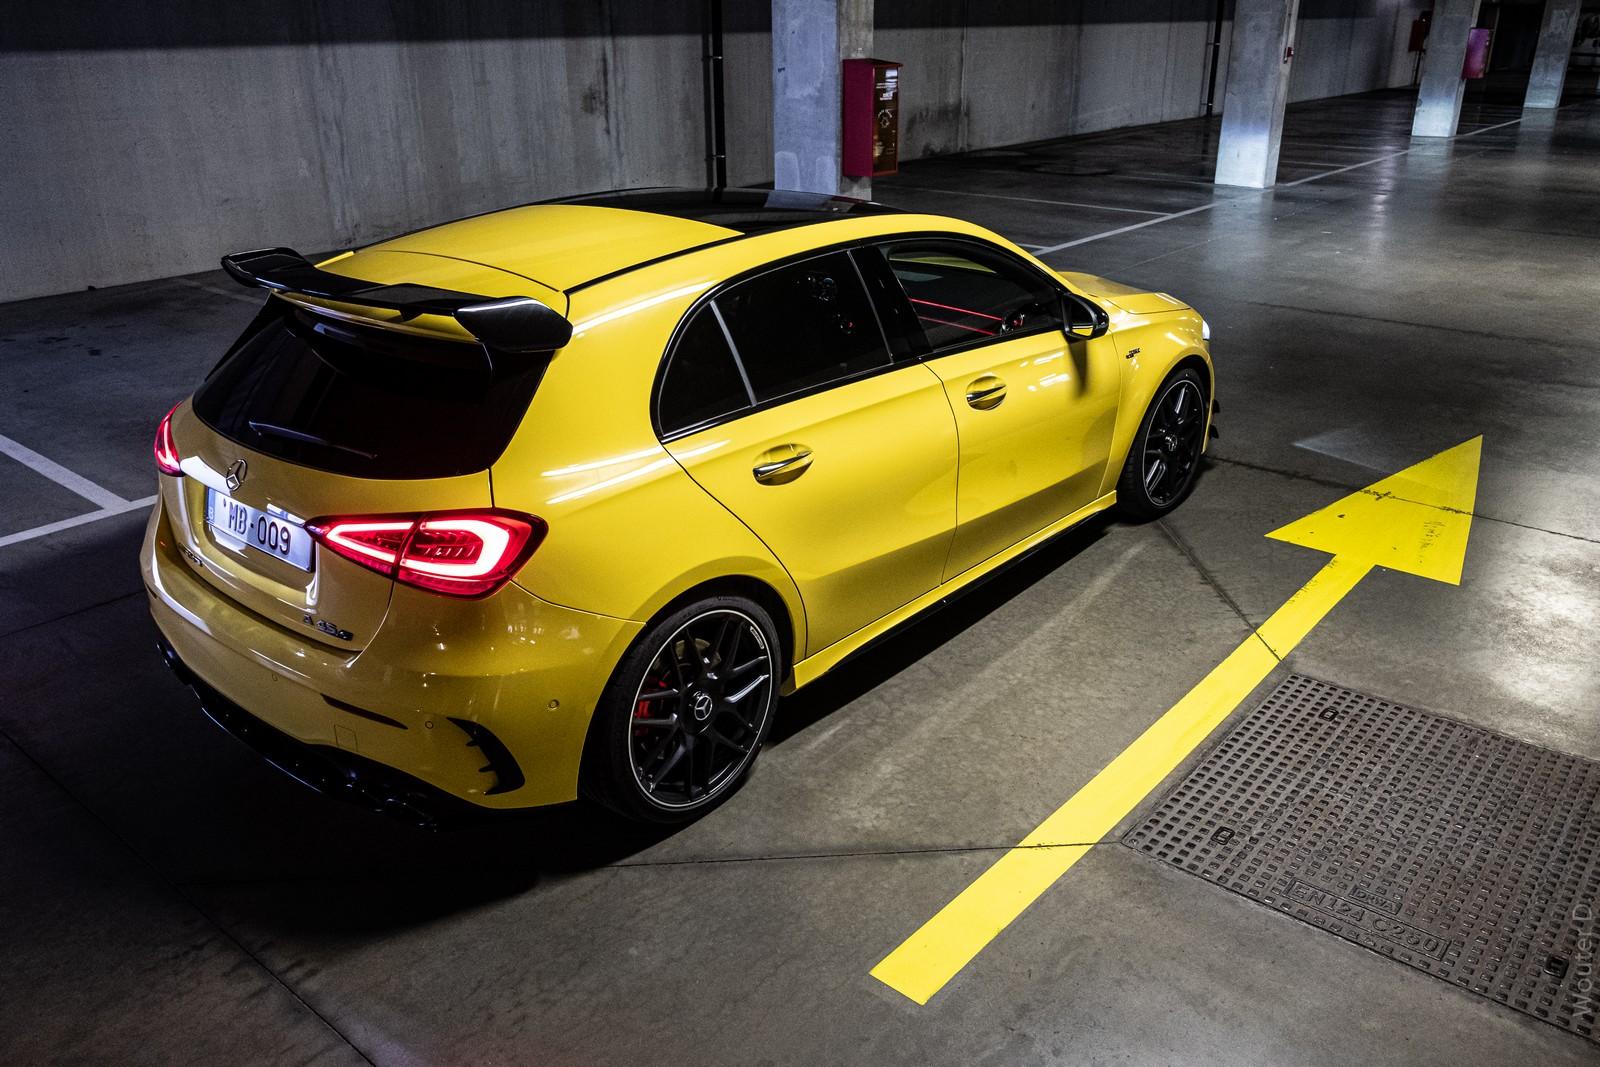 Mercedes-AMG A45 S Power